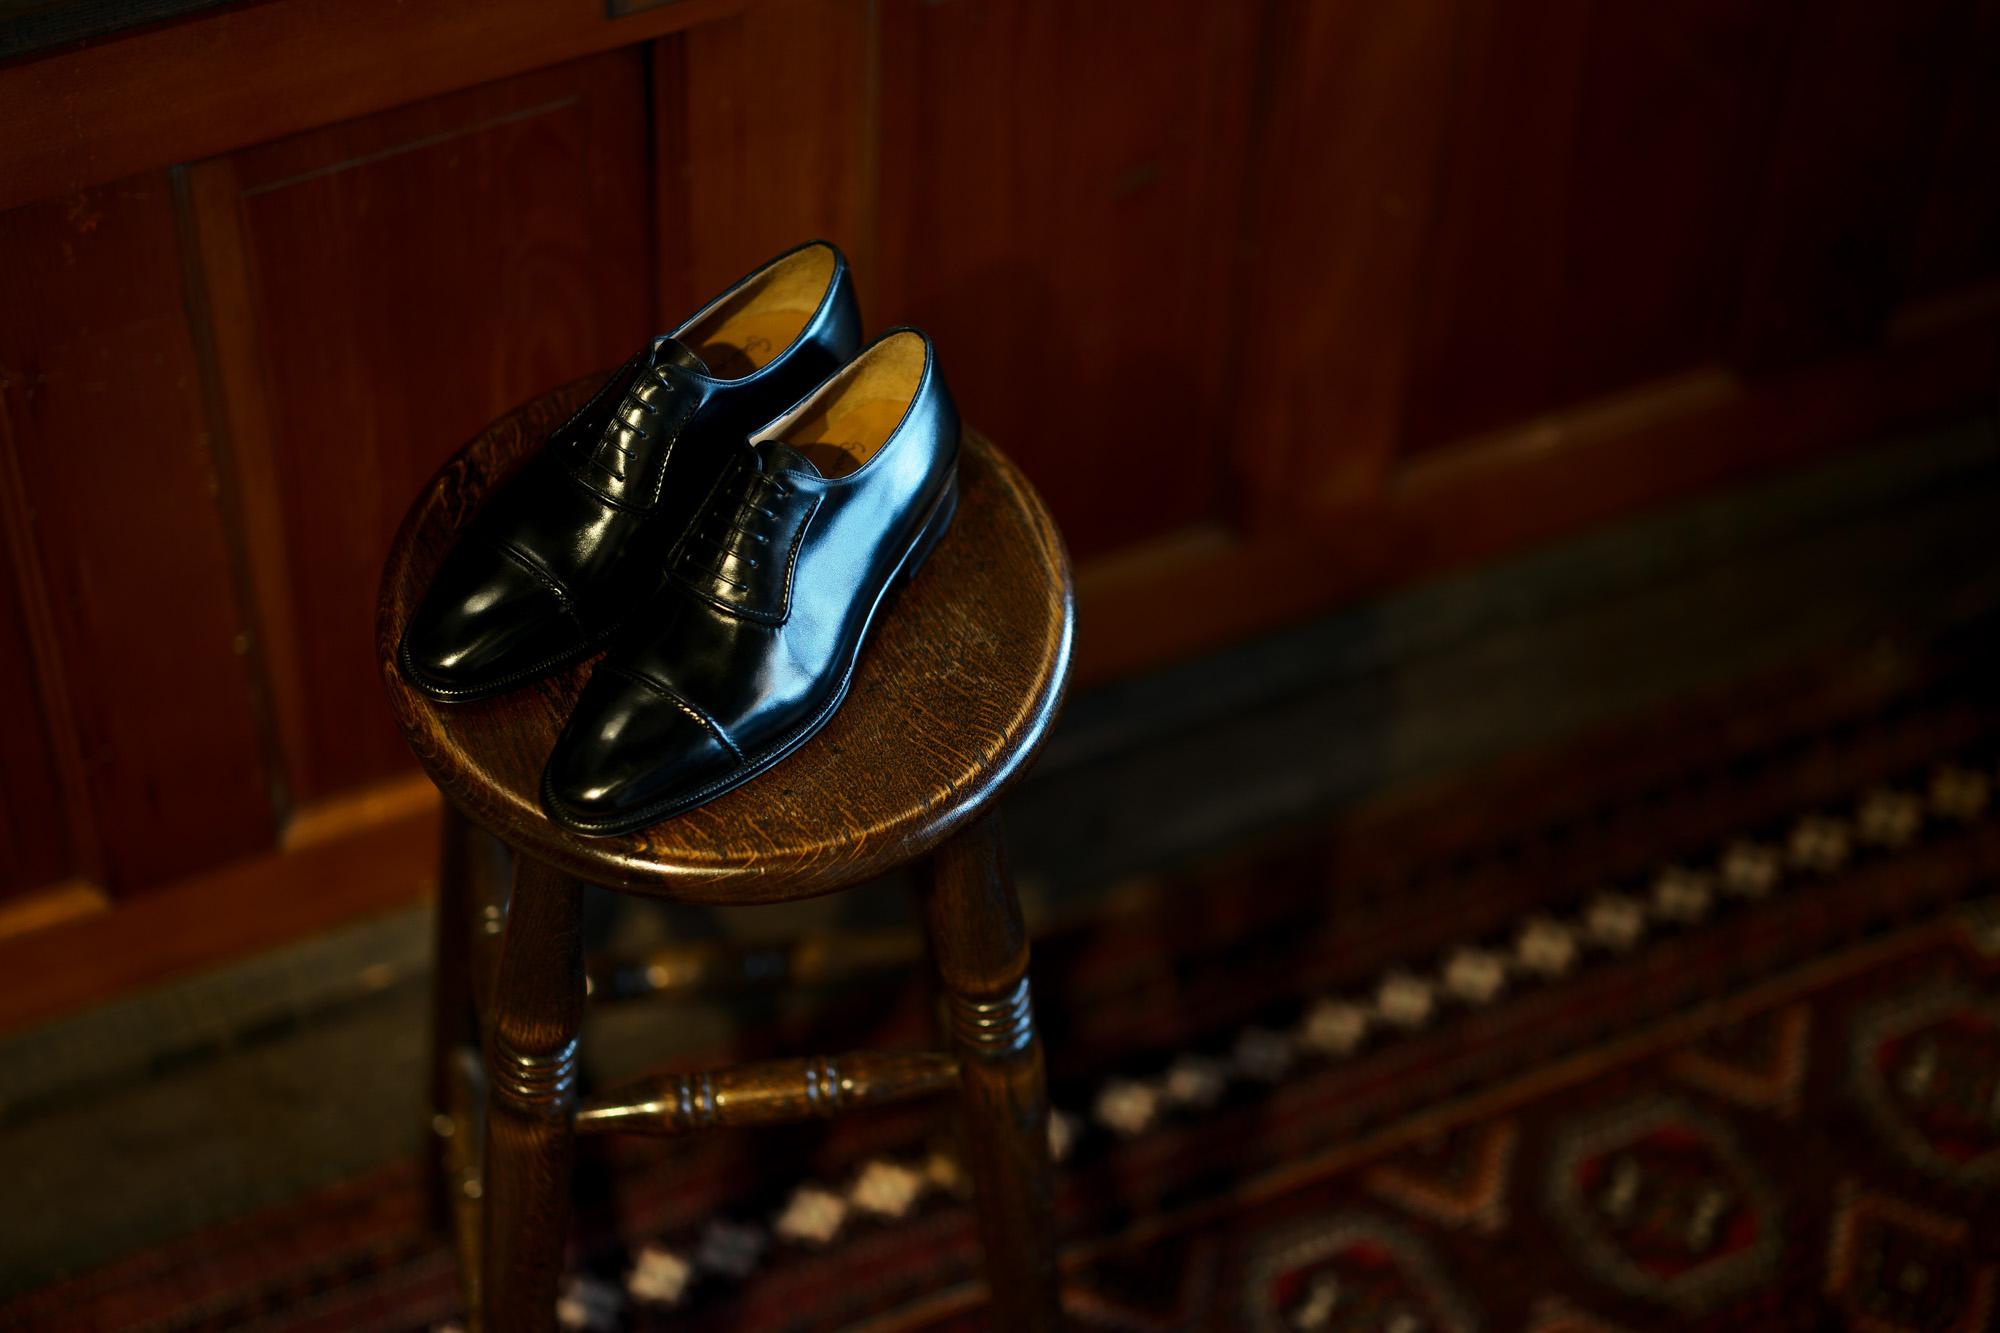 ENZO BONAFE (エンツォボナフェ) ART.3998 mod Straight Tip Shoes Du Puy Vitello デュプイ社ボックスカーフ ストレートチップシューズ NERO (ブラック) made in italy (イタリア製) 2020 春夏新作 【Special Model】【Alto e Diritto 別注】愛知 名古屋 enzobonafe エンツォボナフェ